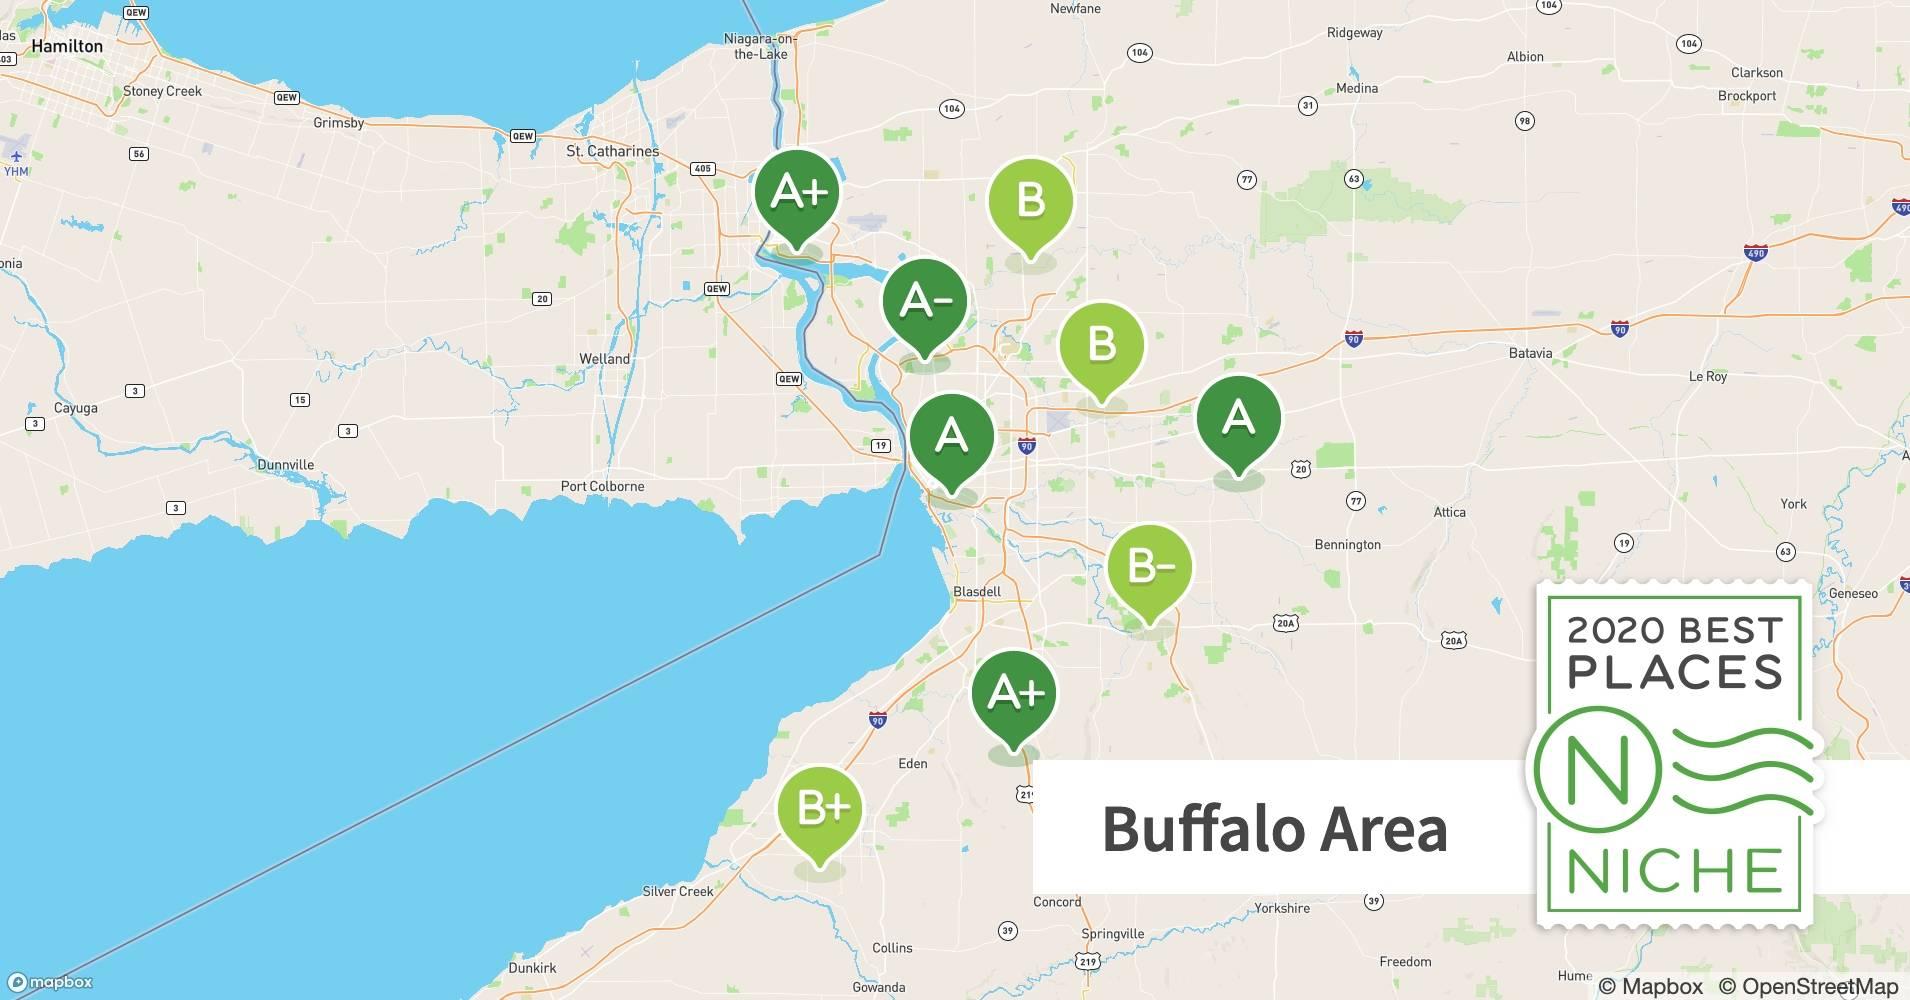 2020 Best Buffalo Area Suburbs To Live Niche